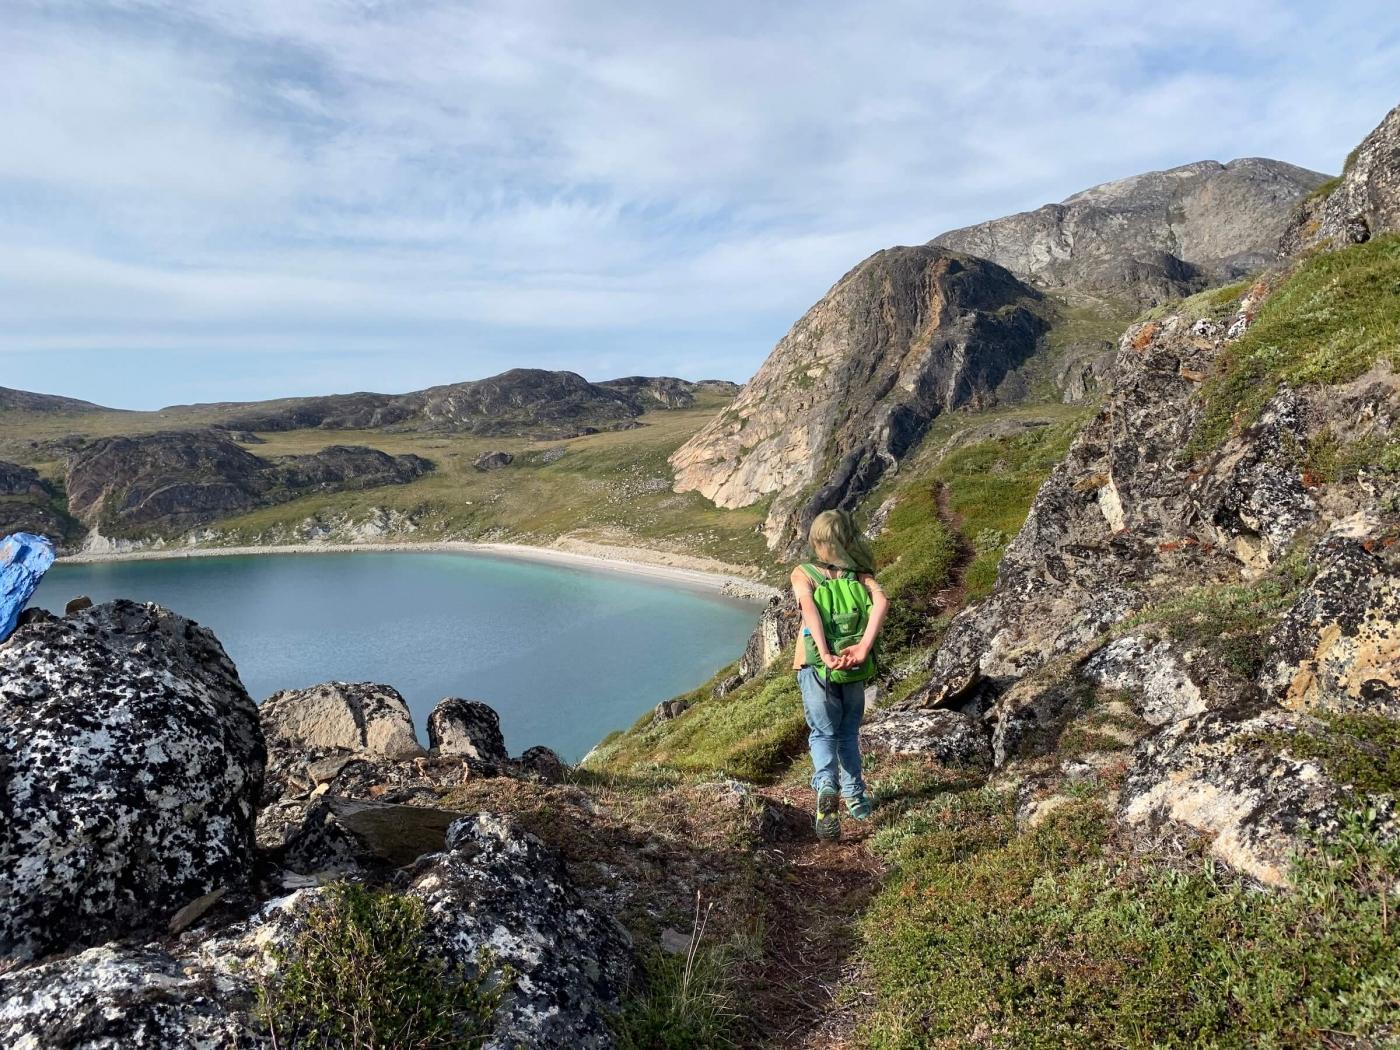 Hiker in the beautiful landscape around Hotel Diskobay. Photo by Espen Andersen, Visit Greenland